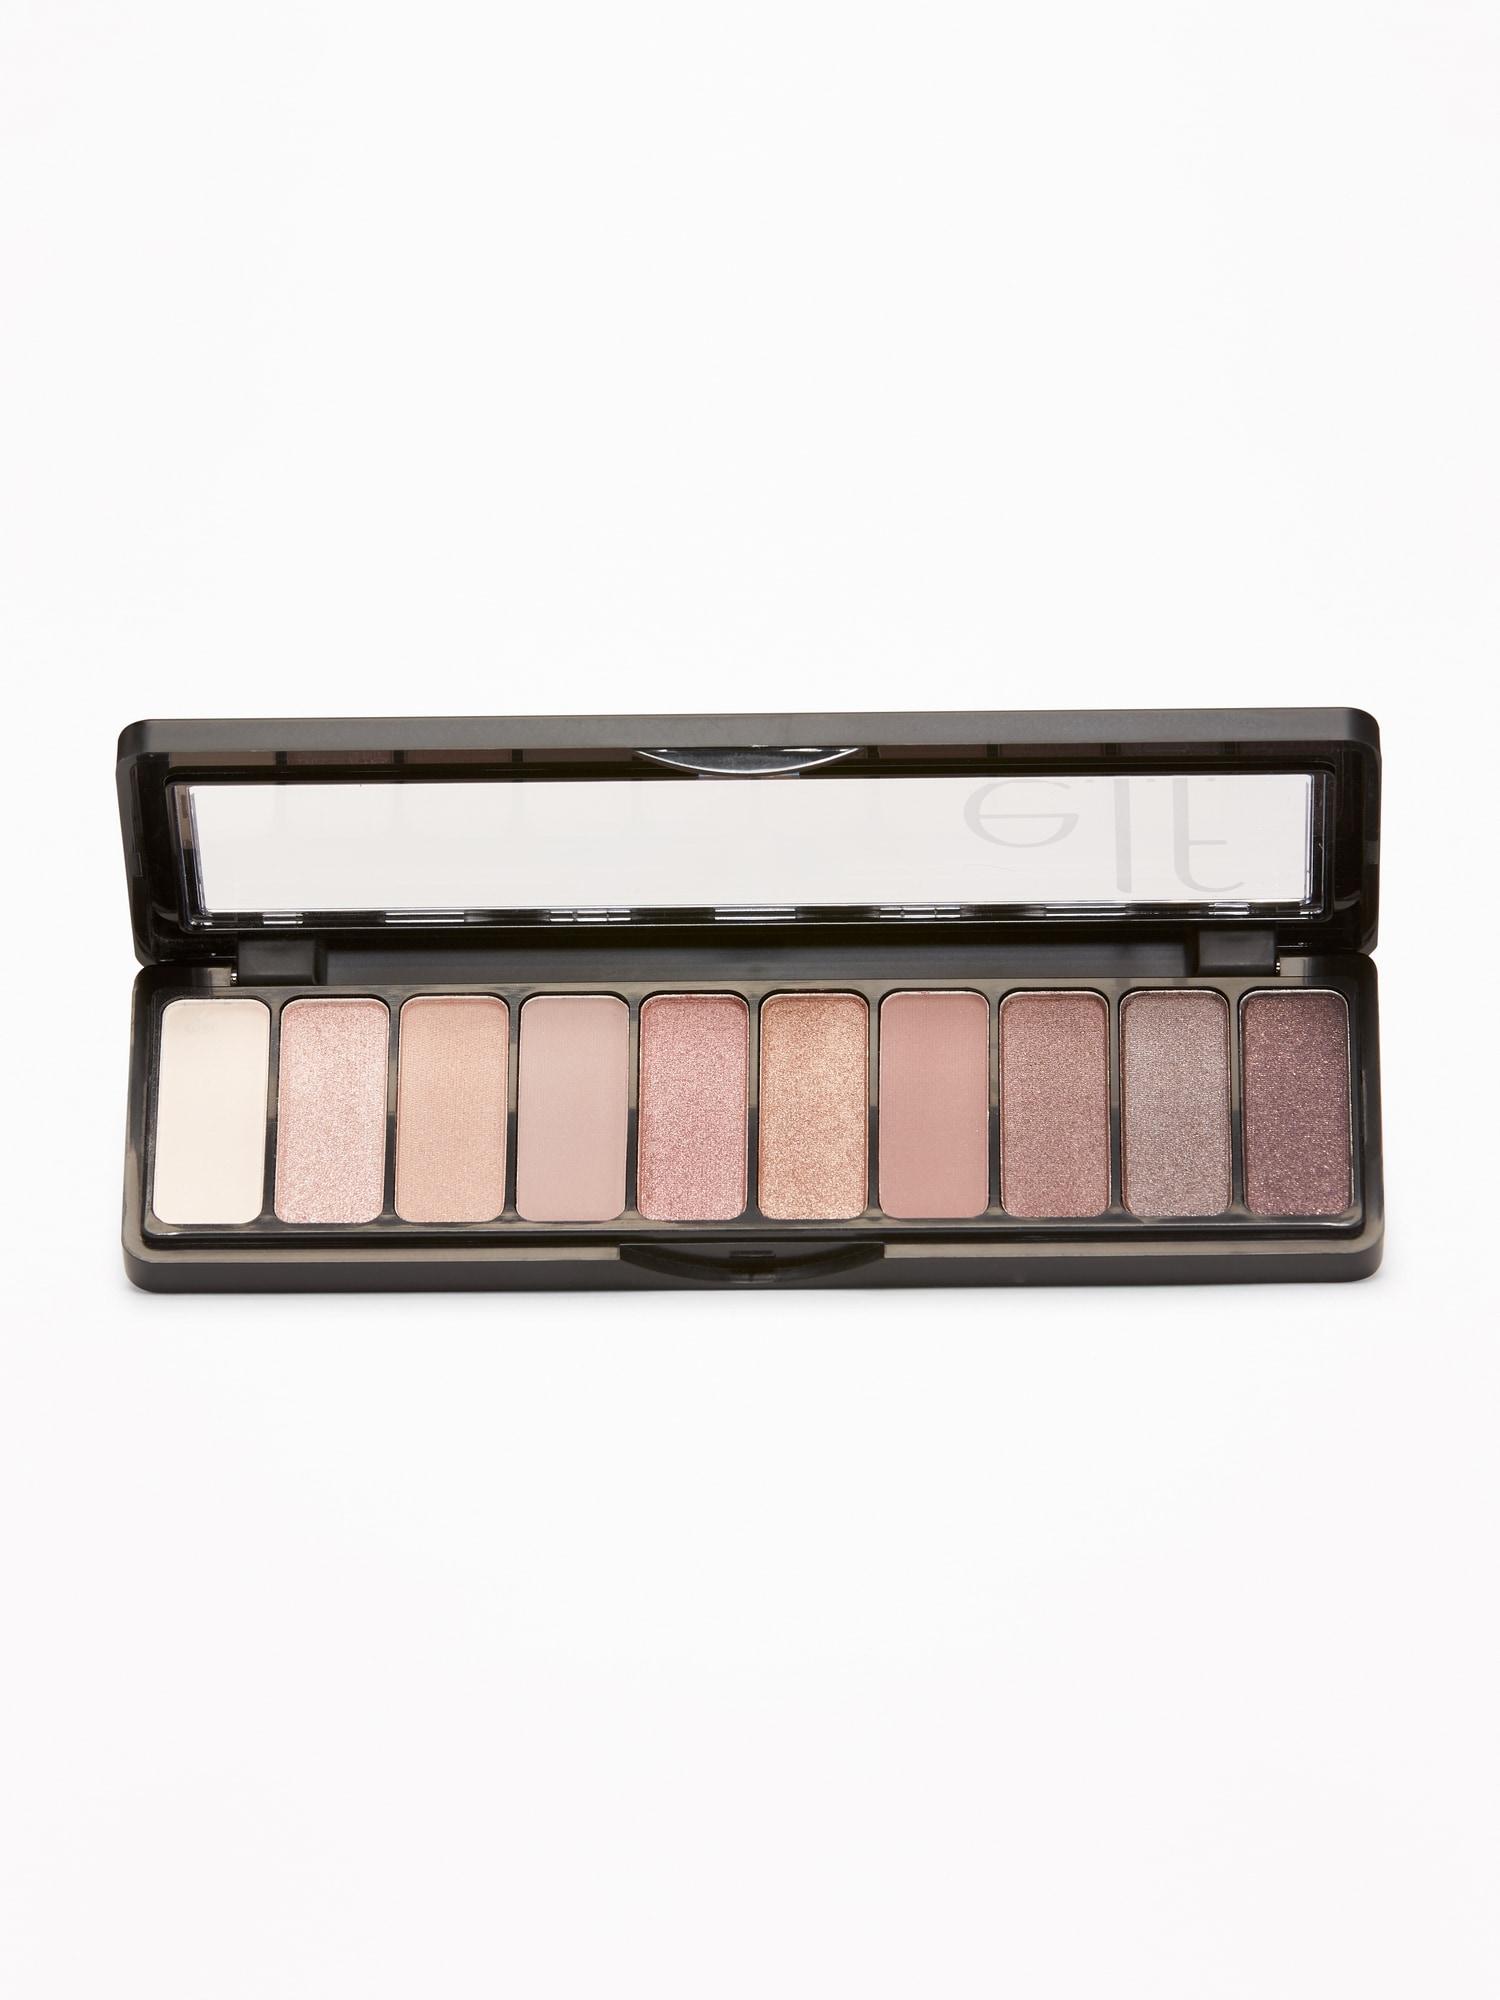 e.l.f. Cosmetics + Mad for Matte Eyeshadow Palette - Jewel Pop